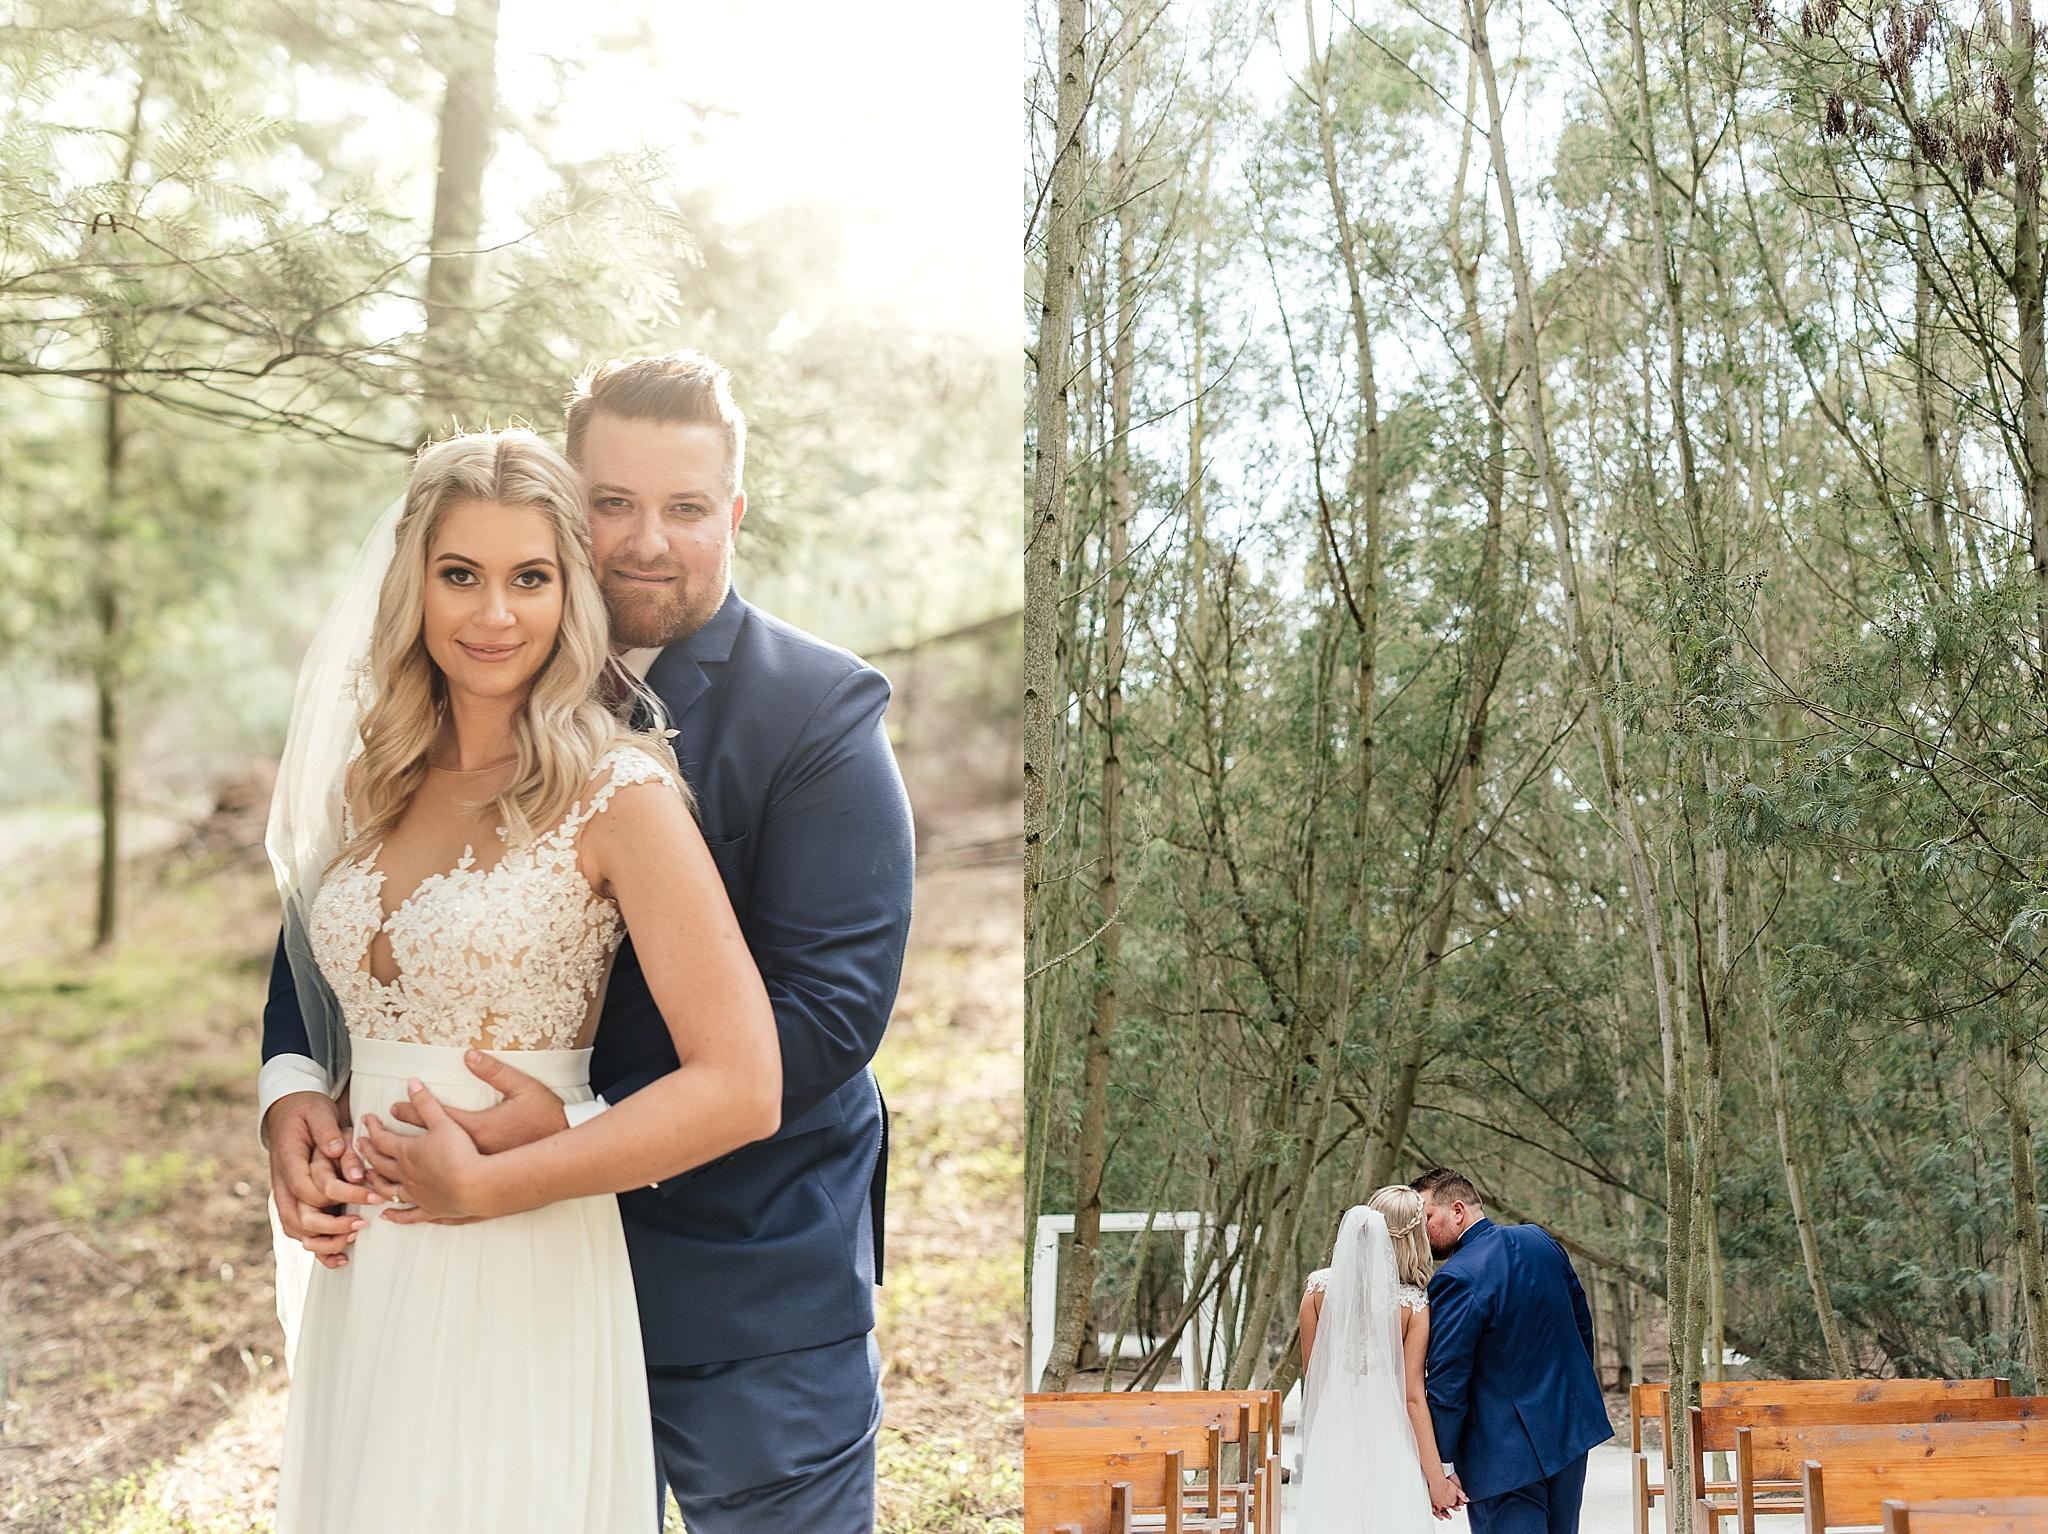 Cape Town Photographer Darren Bester - Die Woud Wedding - Gareth & Roxanne_0028.jpg